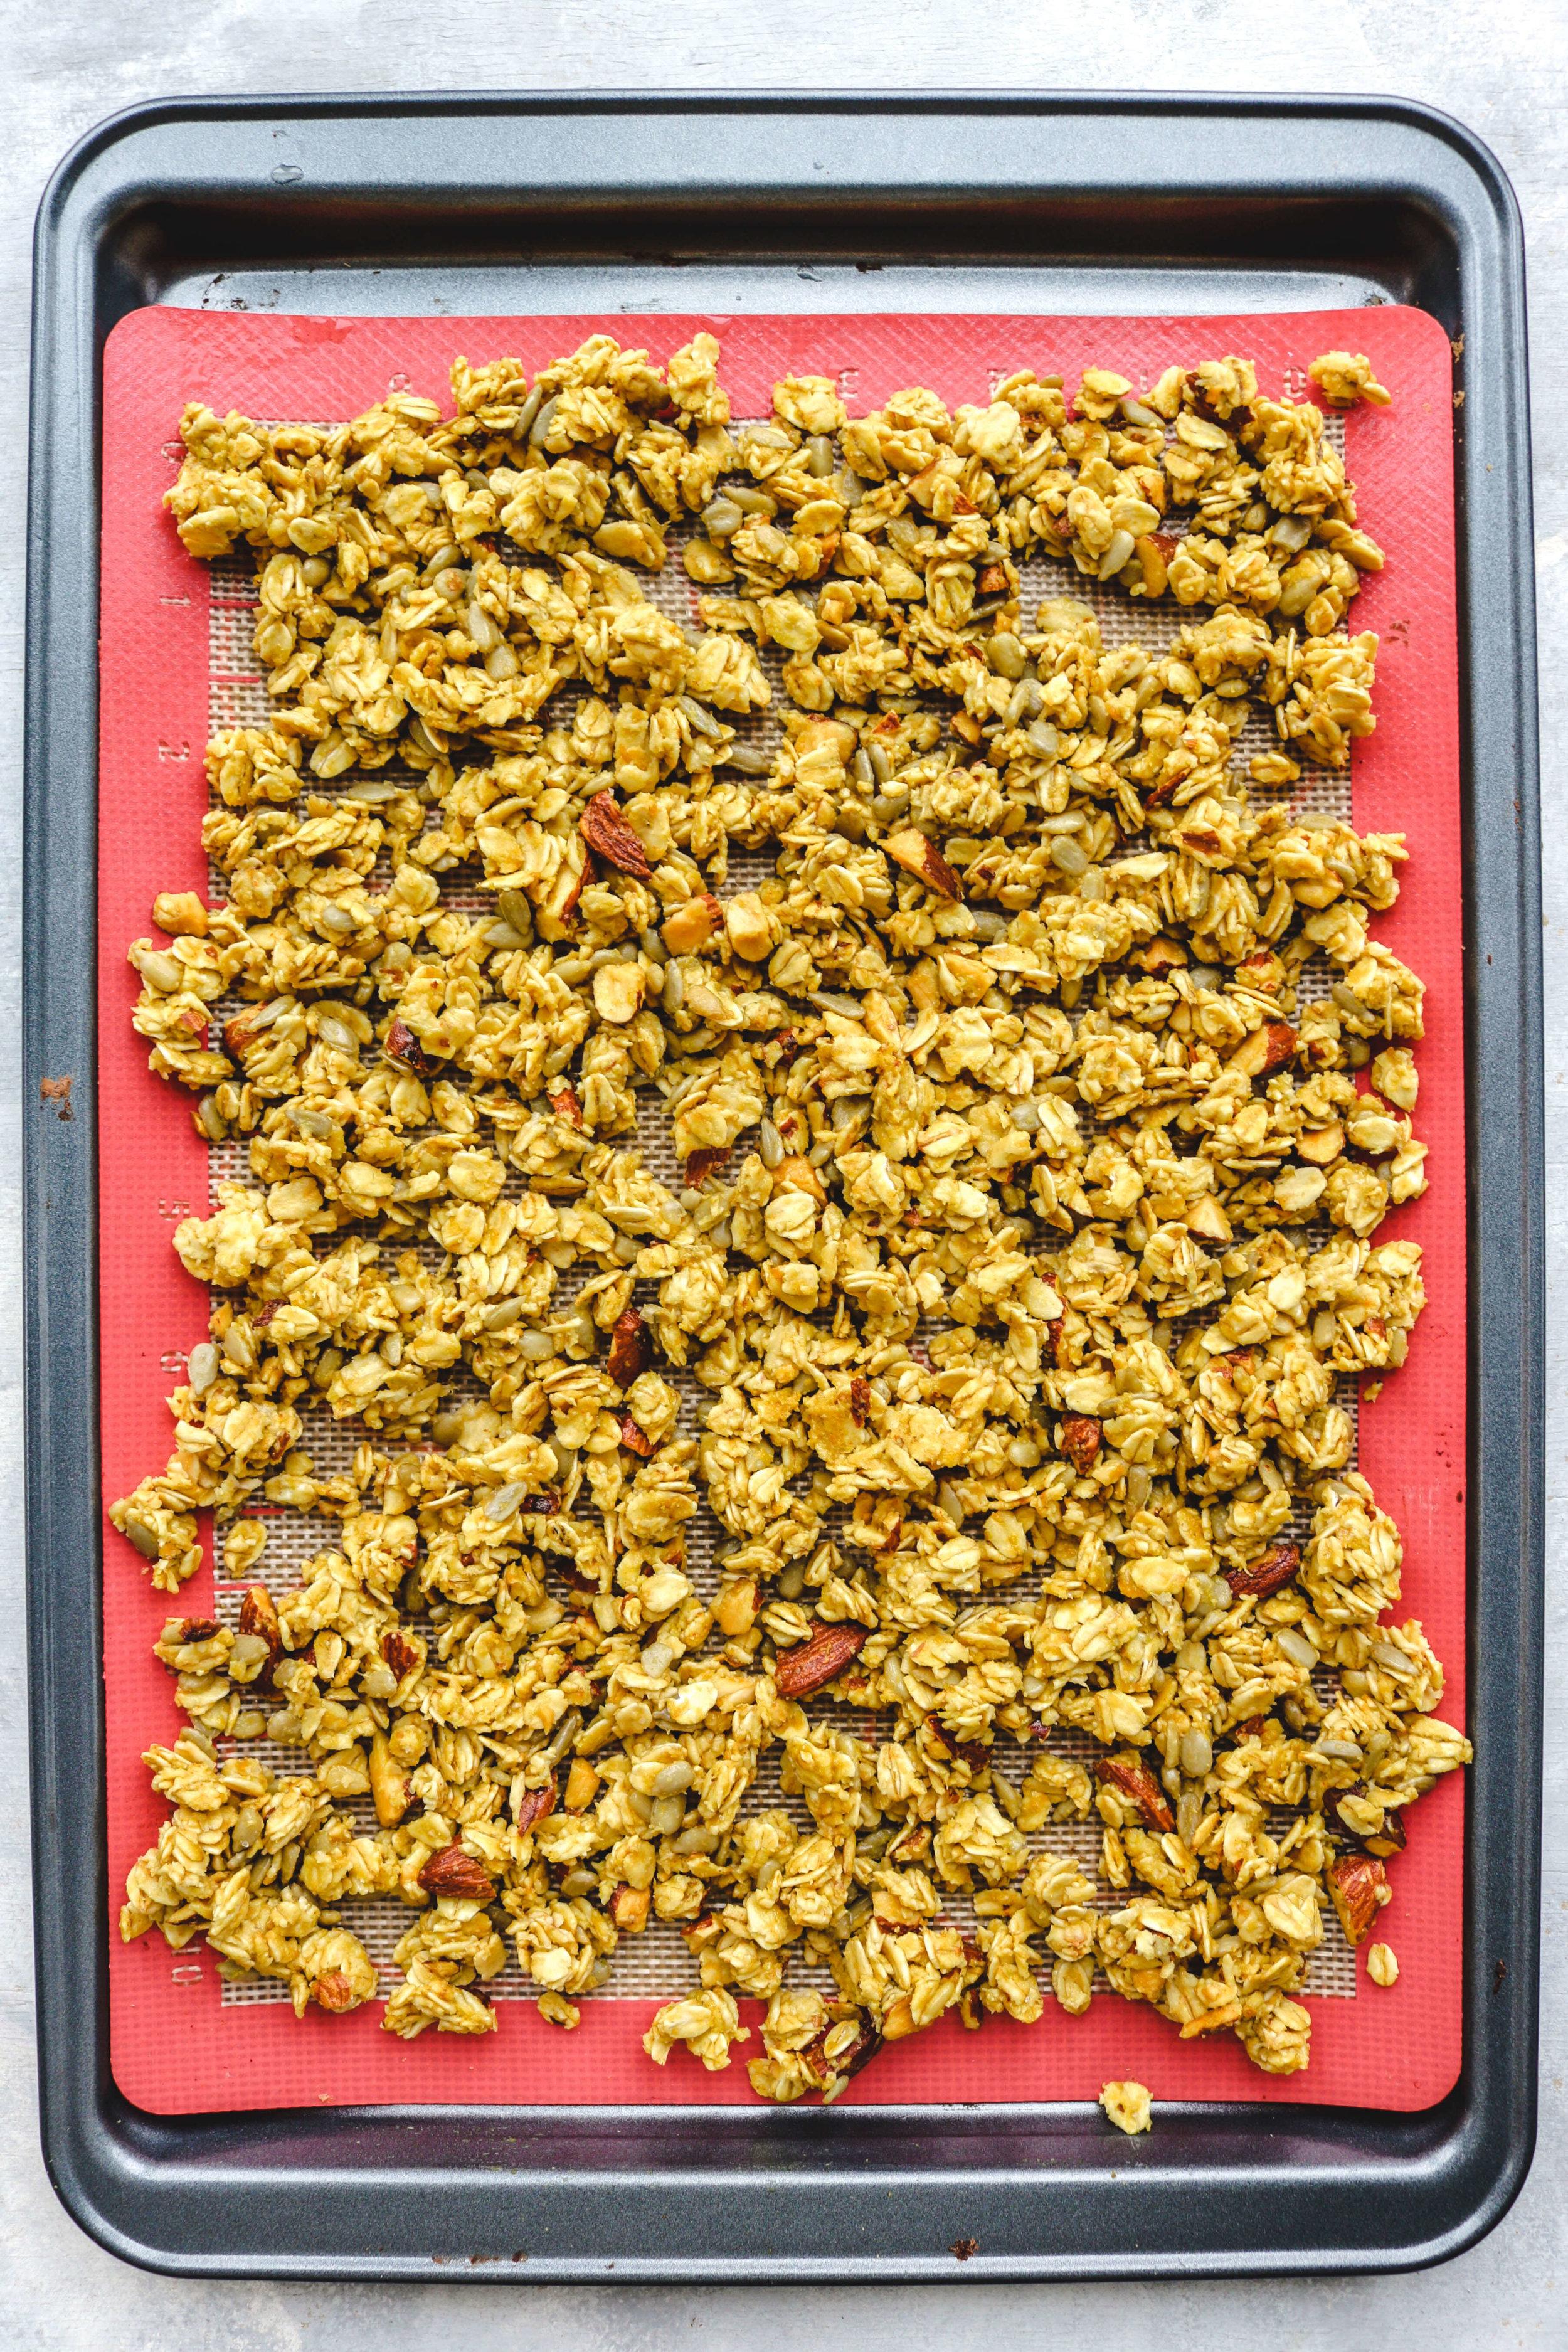 savoury cheese granola oil free gluten free vegan -3.jpg